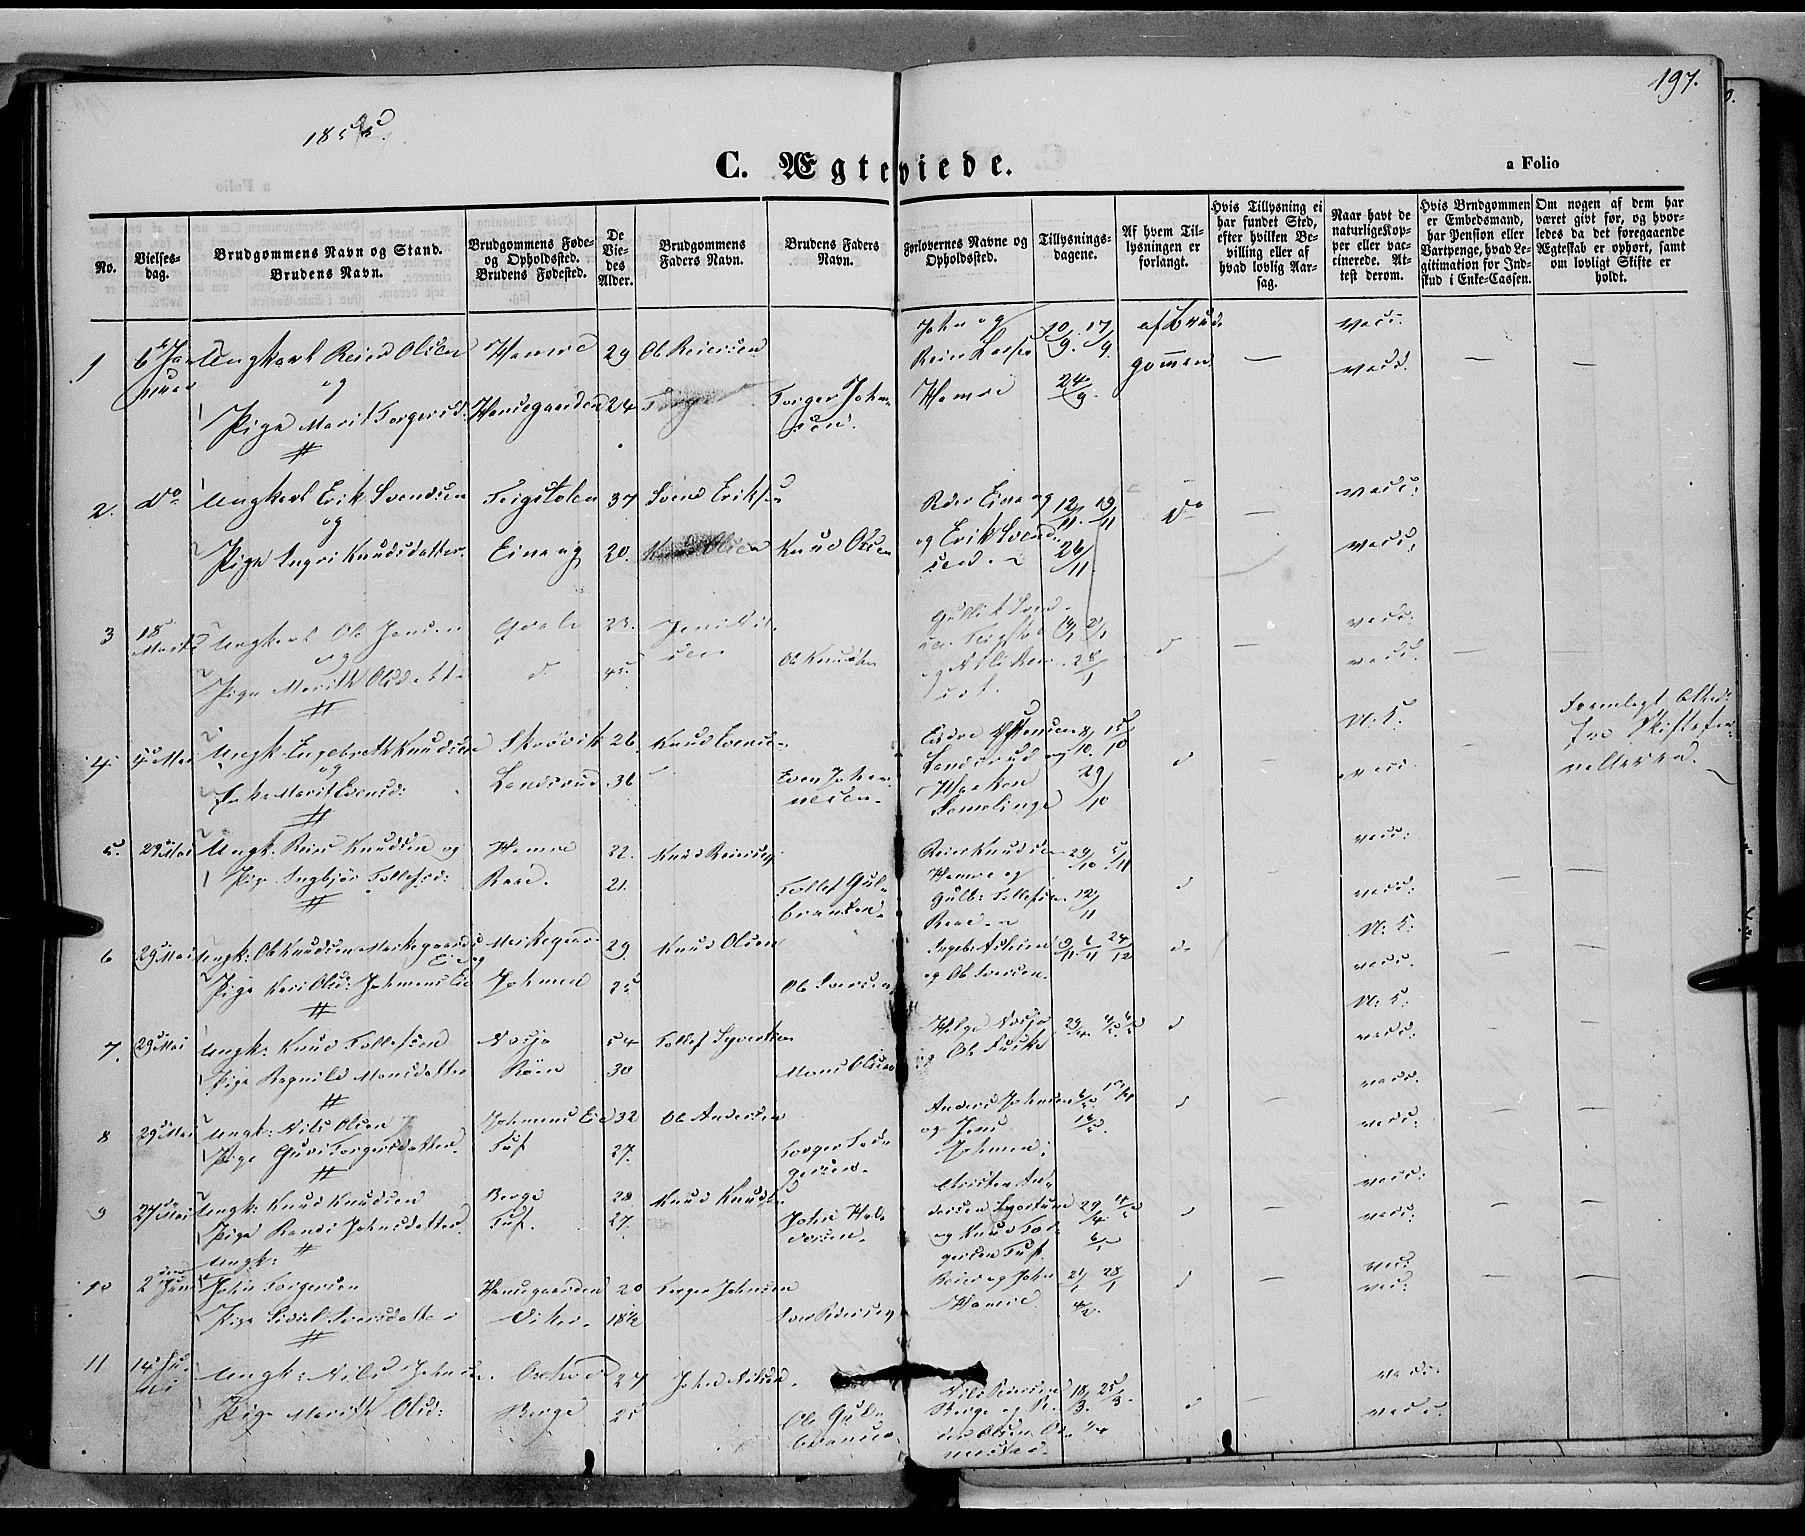 SAH, Vestre Slidre prestekontor, Ministerialbok nr. 1, 1844-1855, s. 197